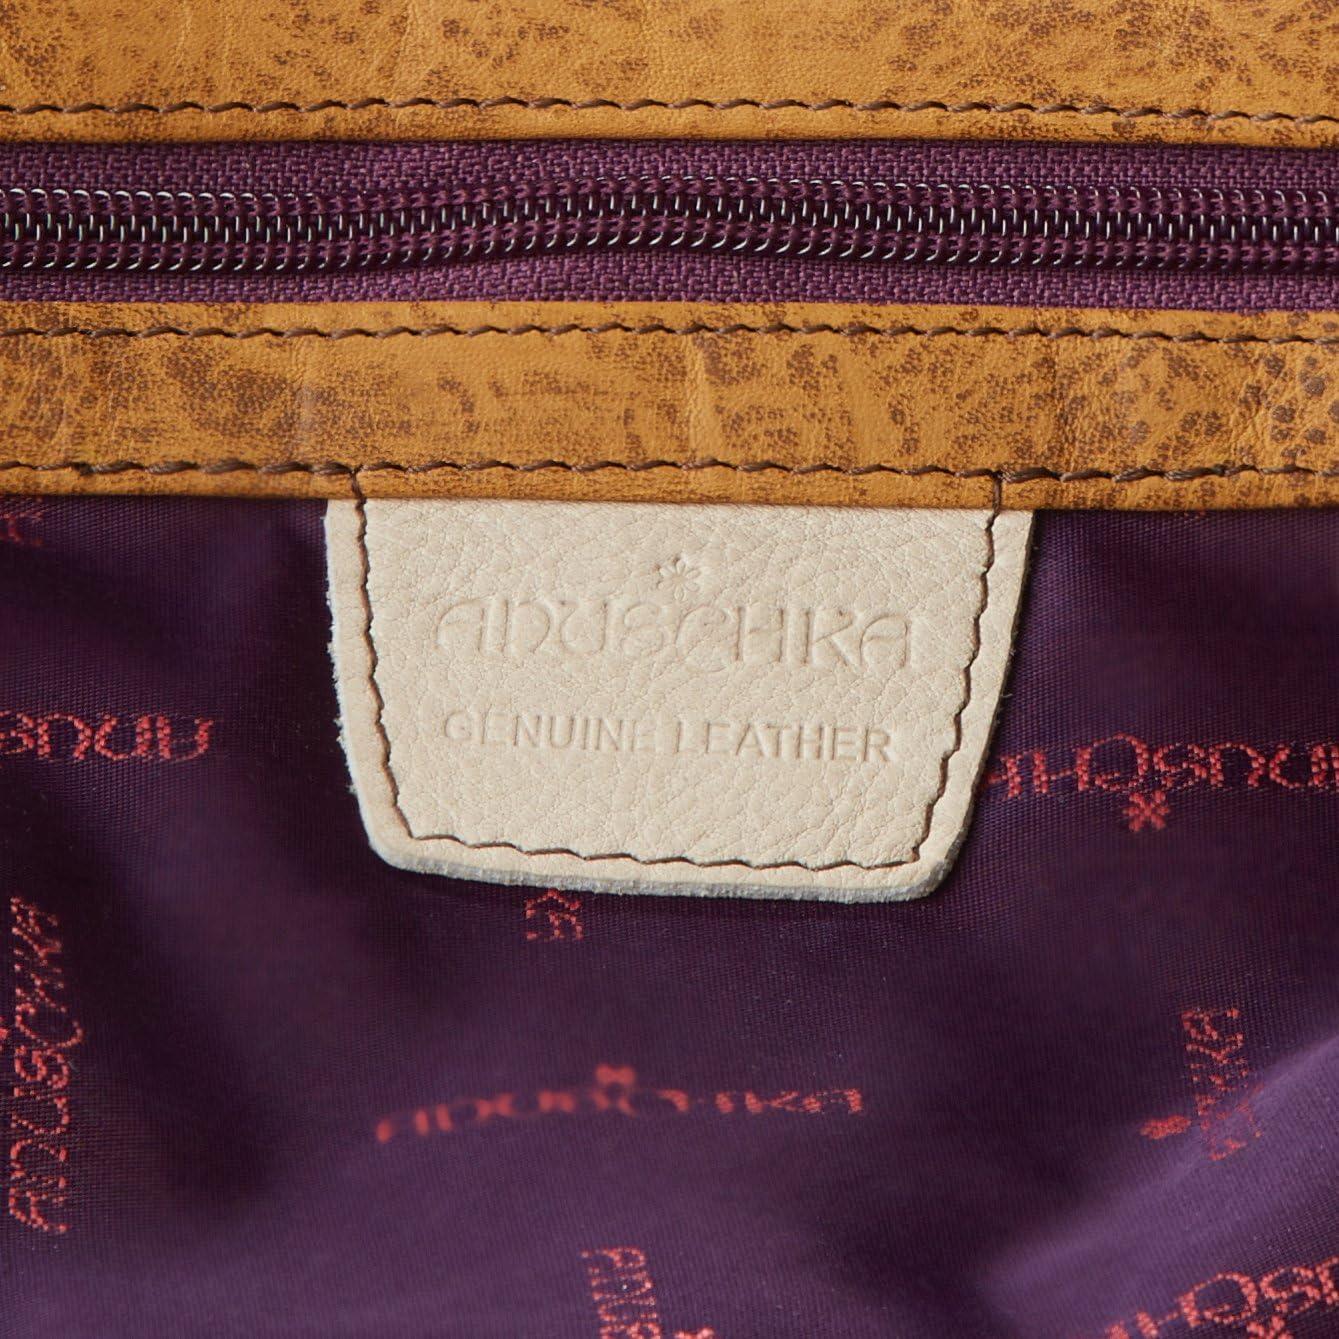 Top Zip Hobo//Shoulder Bag Anuschka Womens Genuine Leather Bag